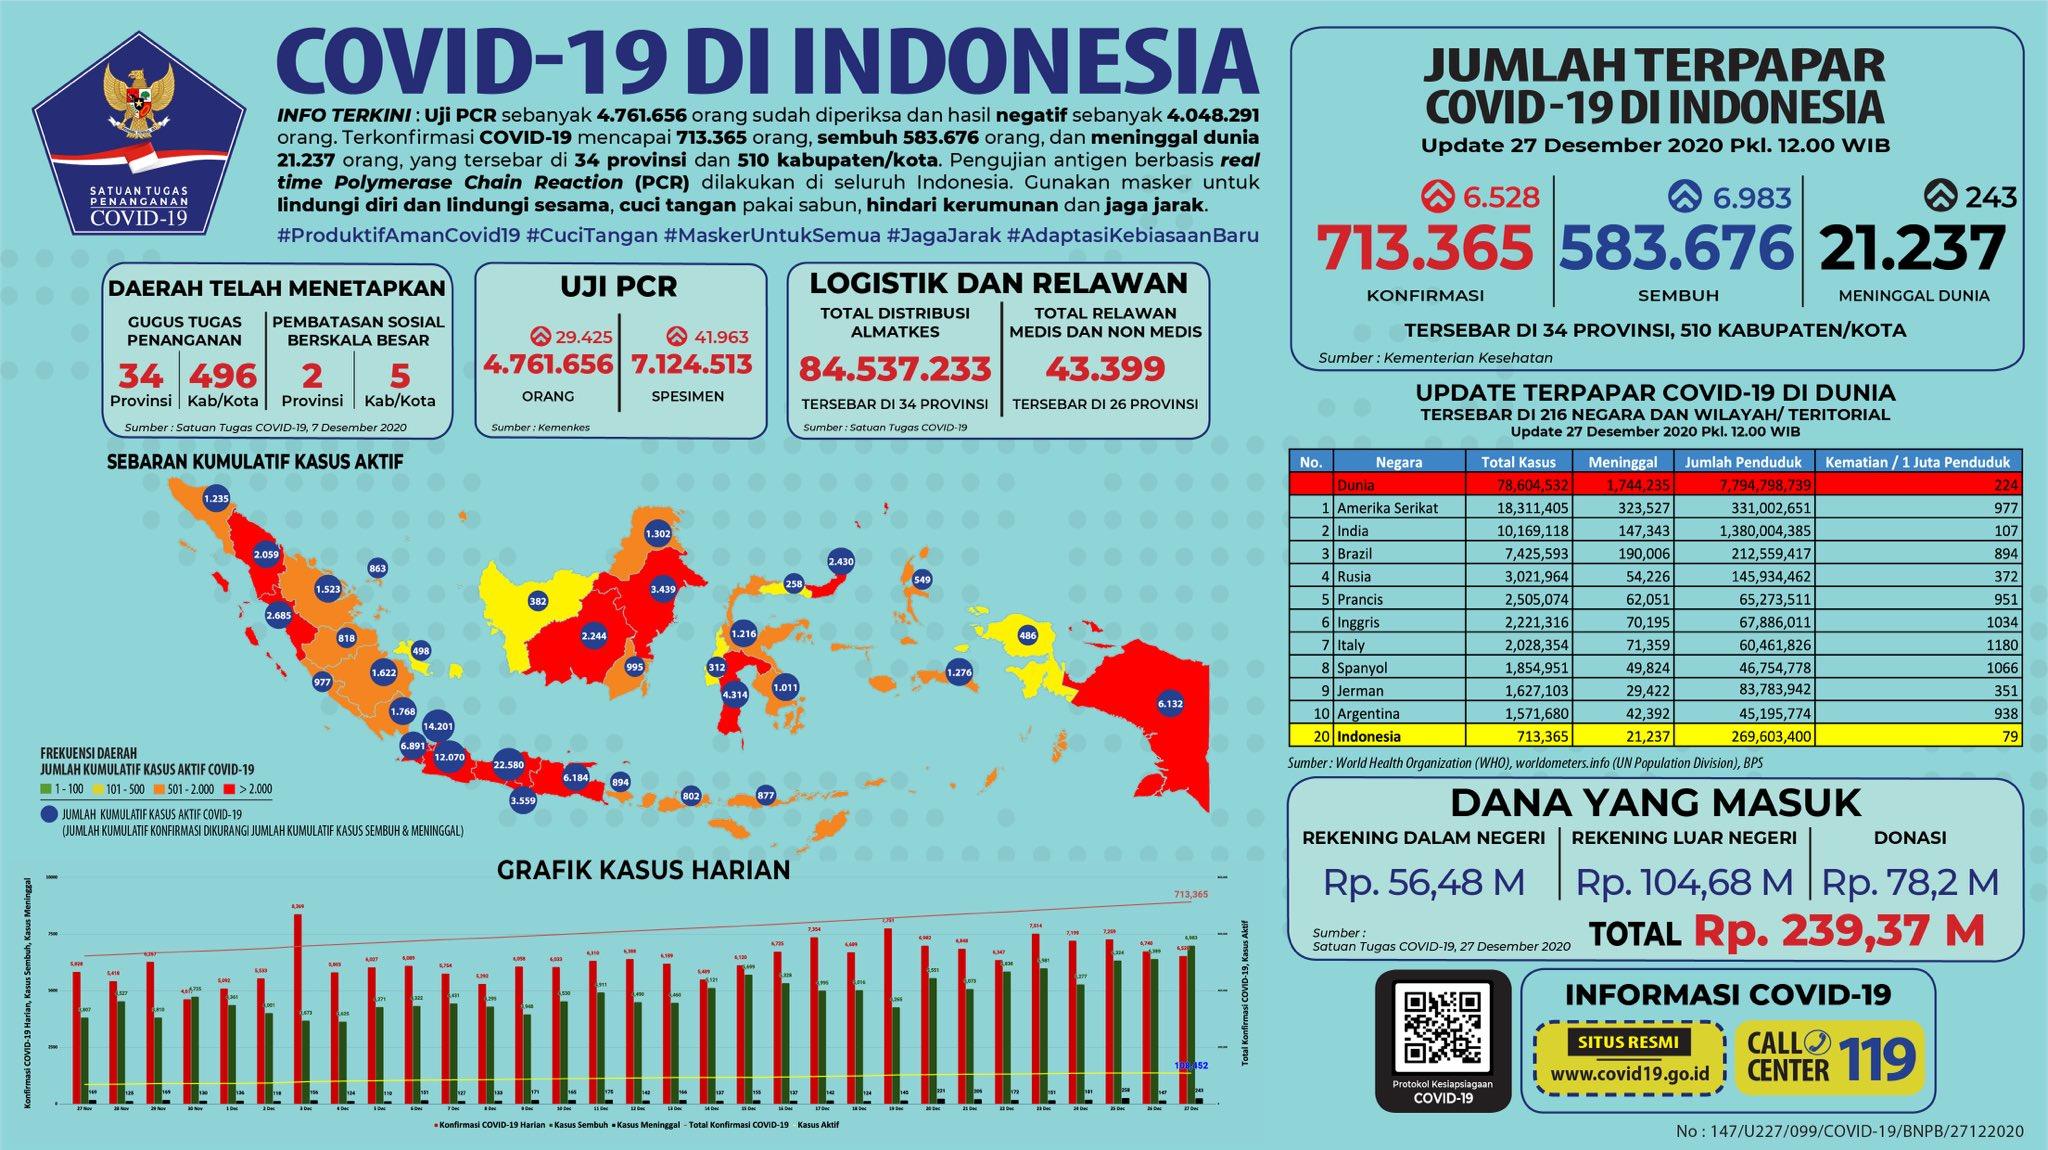 Infografik Covid-19 di Indonesia